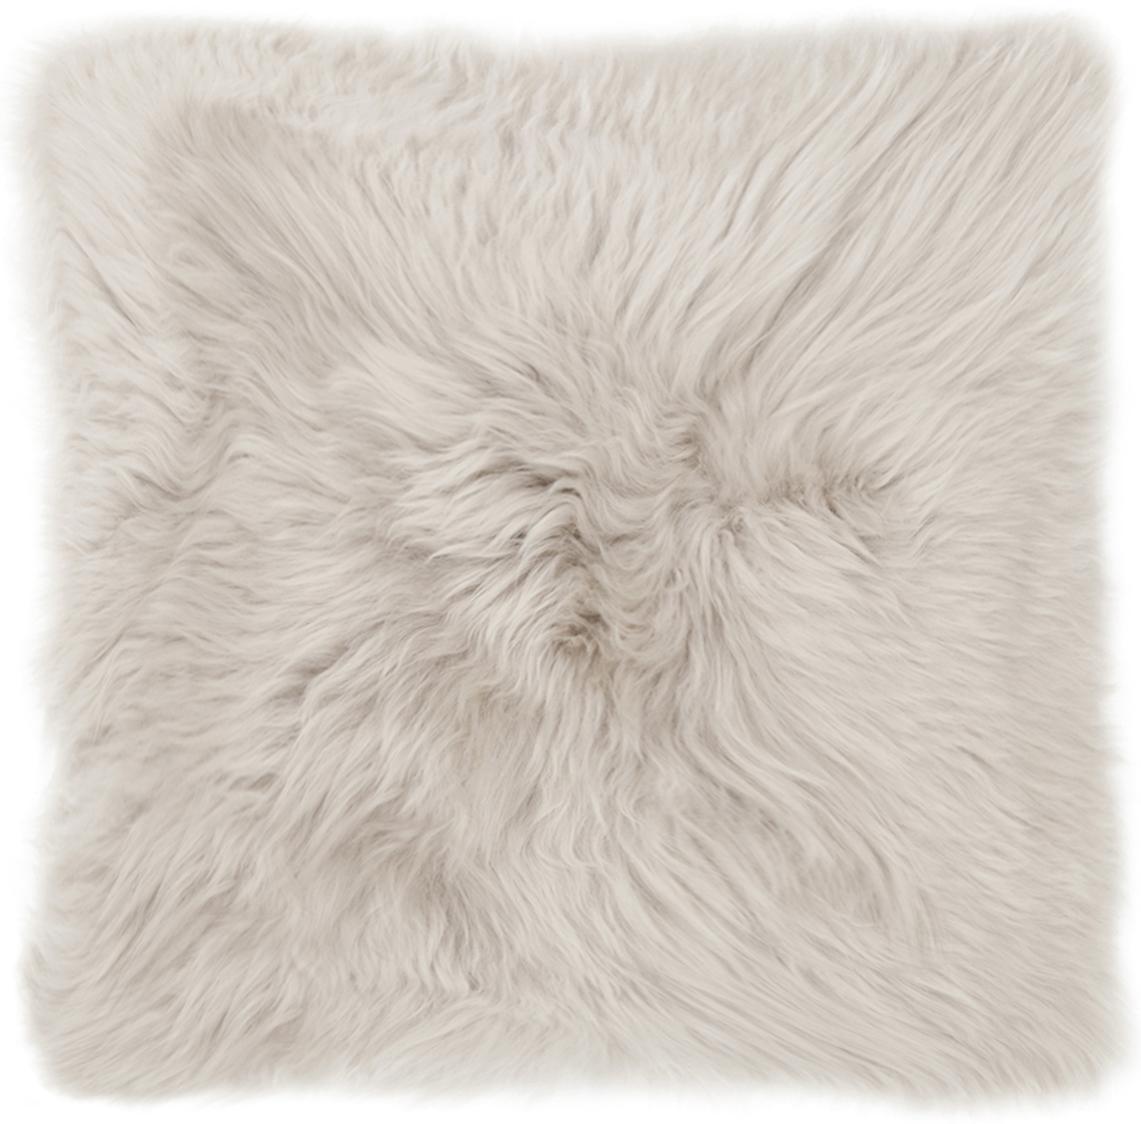 Funda de cojín de piel de oveja Oslo, Parte delantera: 100%piel de oveja, Parte trasera: lino, Beige, gris claro, An 40 x L 40 cm